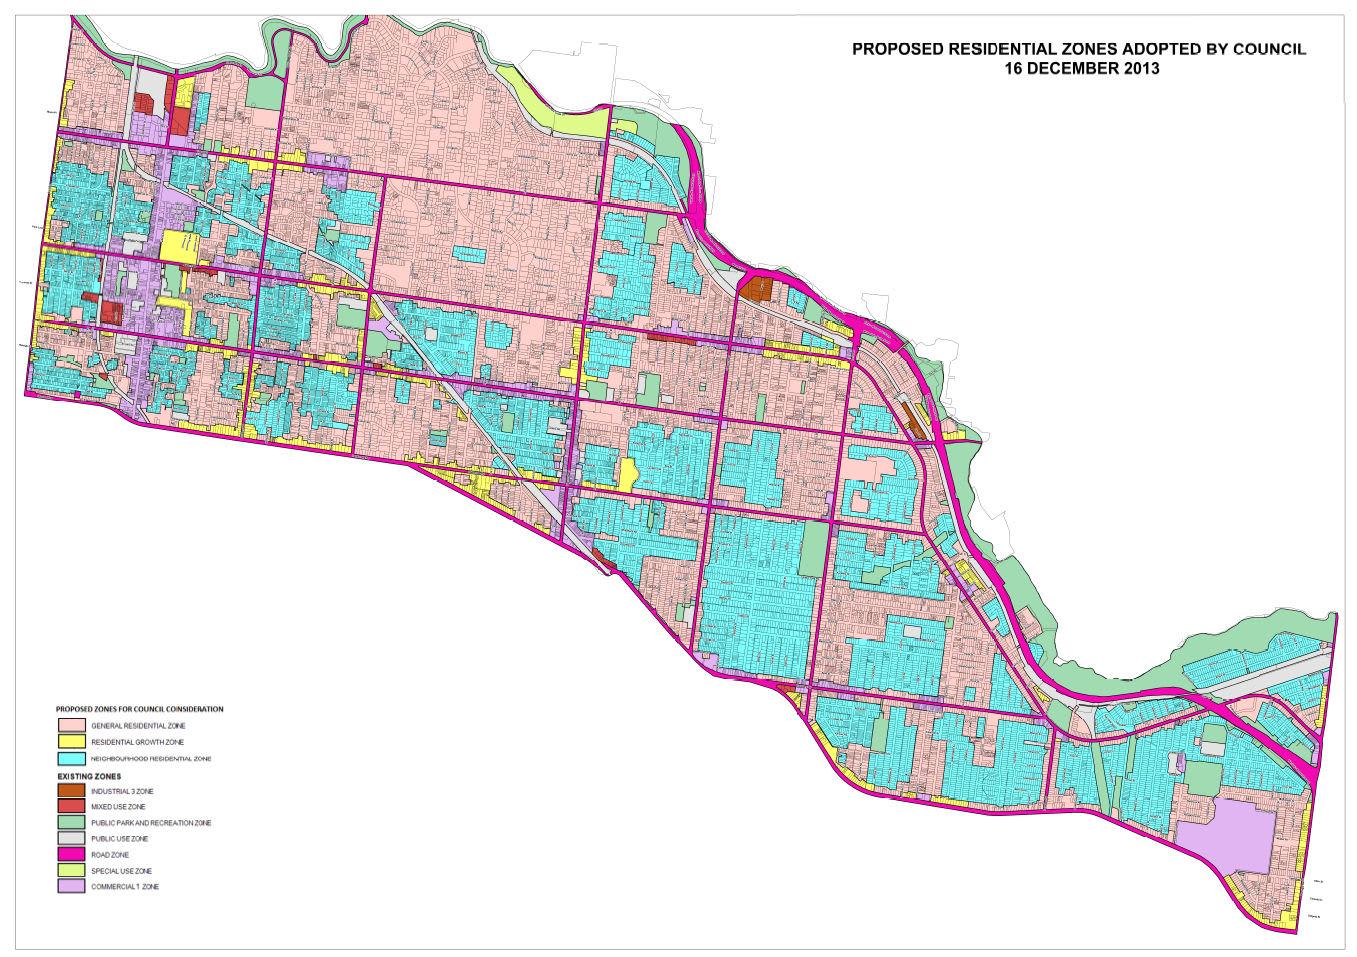 Reformed planning zones: City of Stonnington